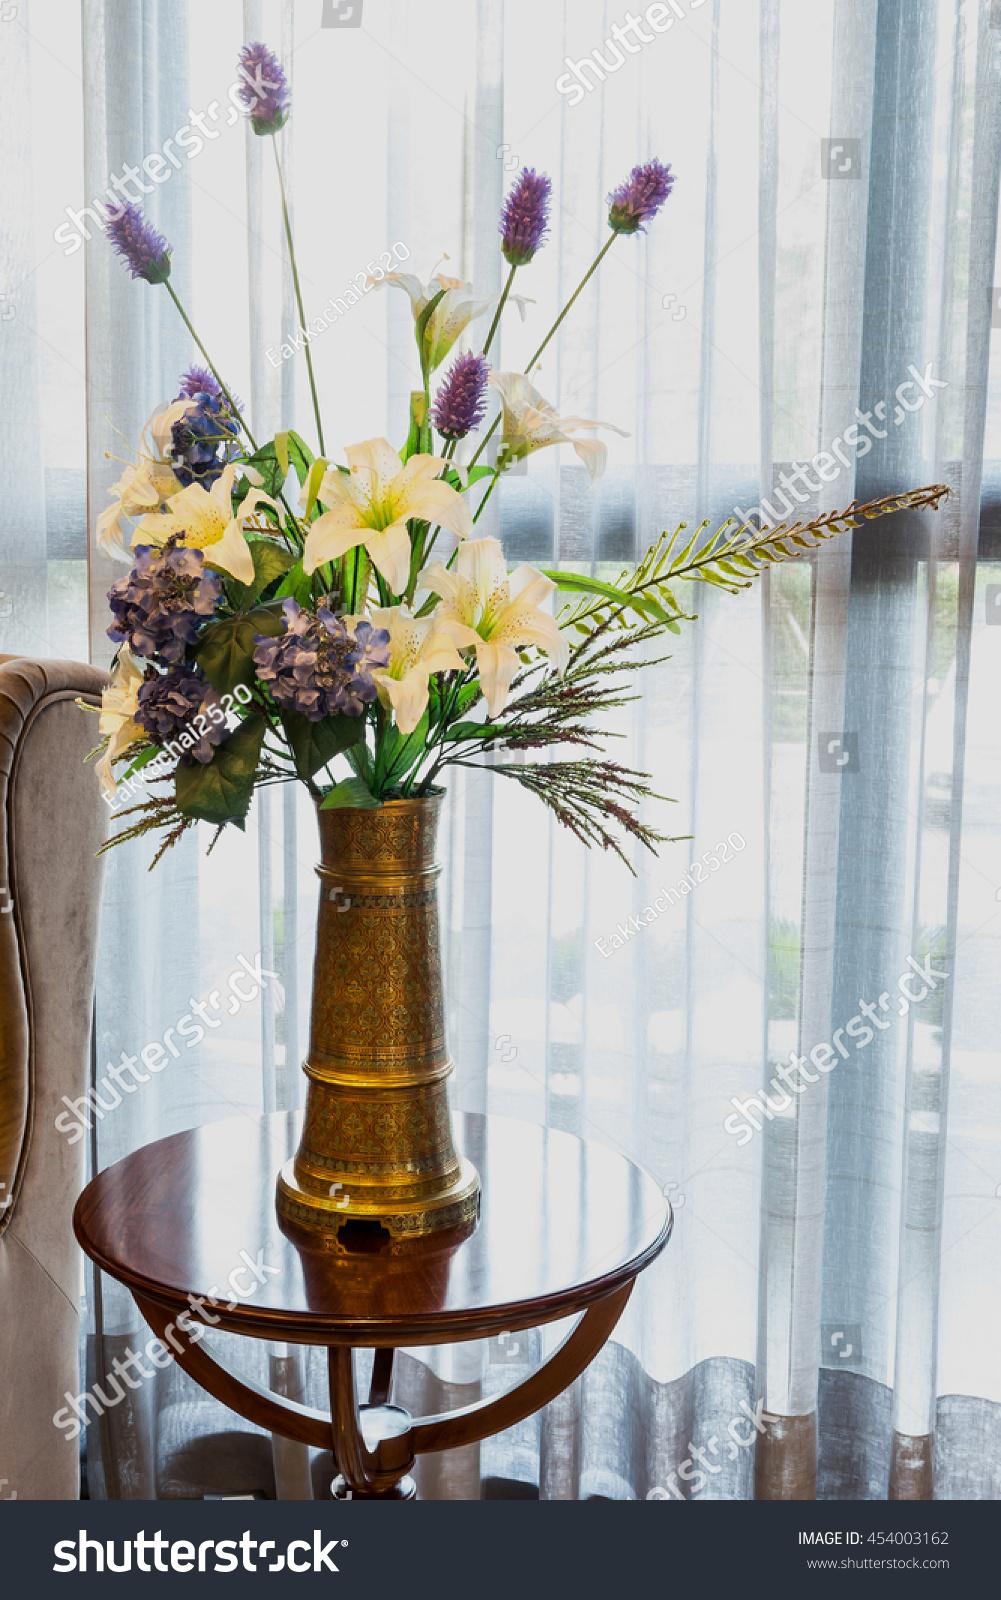 Put Flowers Vase Beautiful Stock Photo 454003162